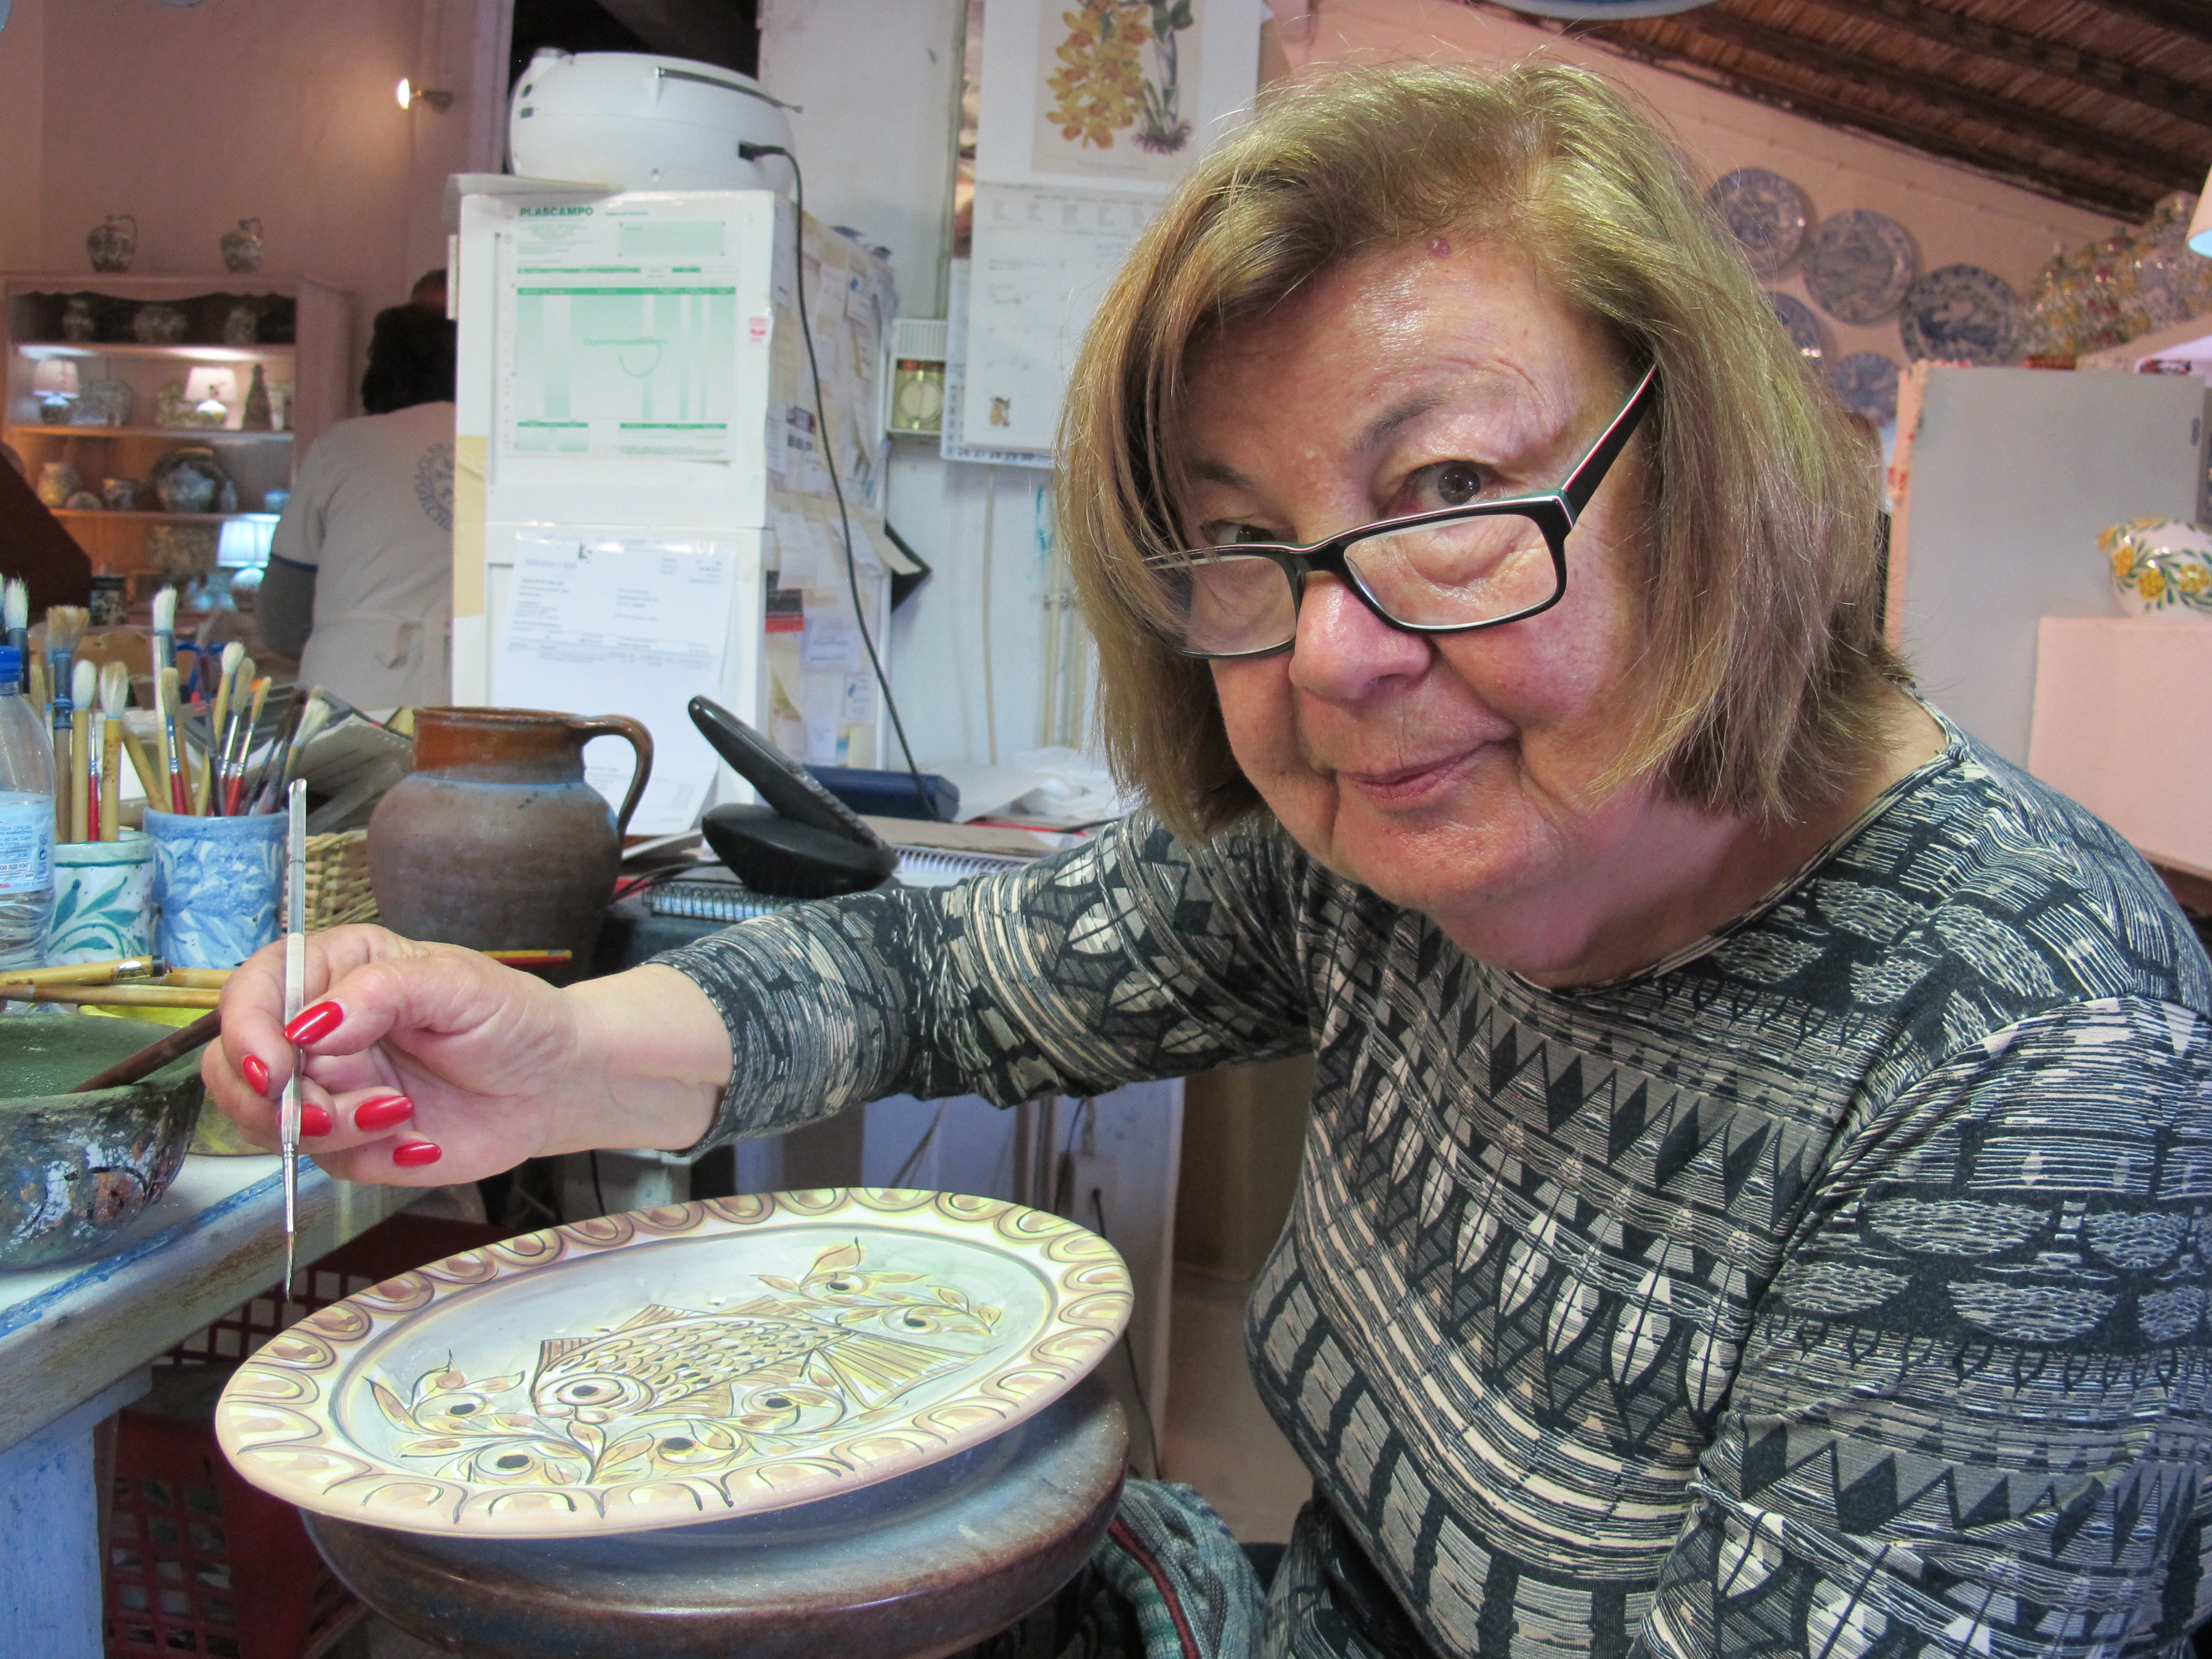 Töpfern, Keramik, Portugal, Algarve, Handwerk, Handwerkskunst, Reisefeder, blog, travelblog, Reiseblog